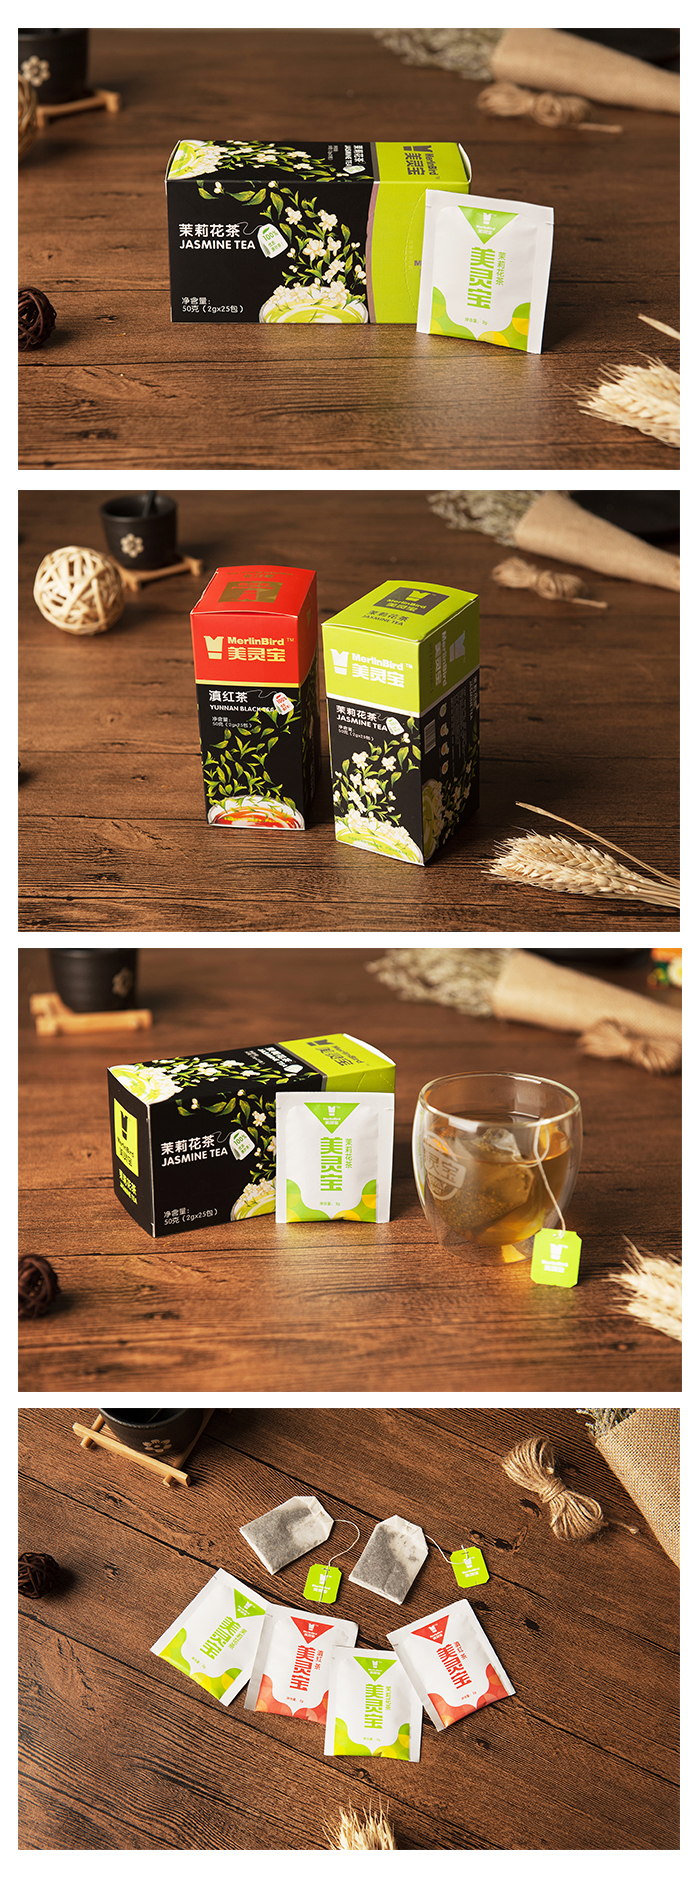 Double Chamber Teabags Yunnan Black Tea 25 Pcs packing - 4uTea | 4uTea.com